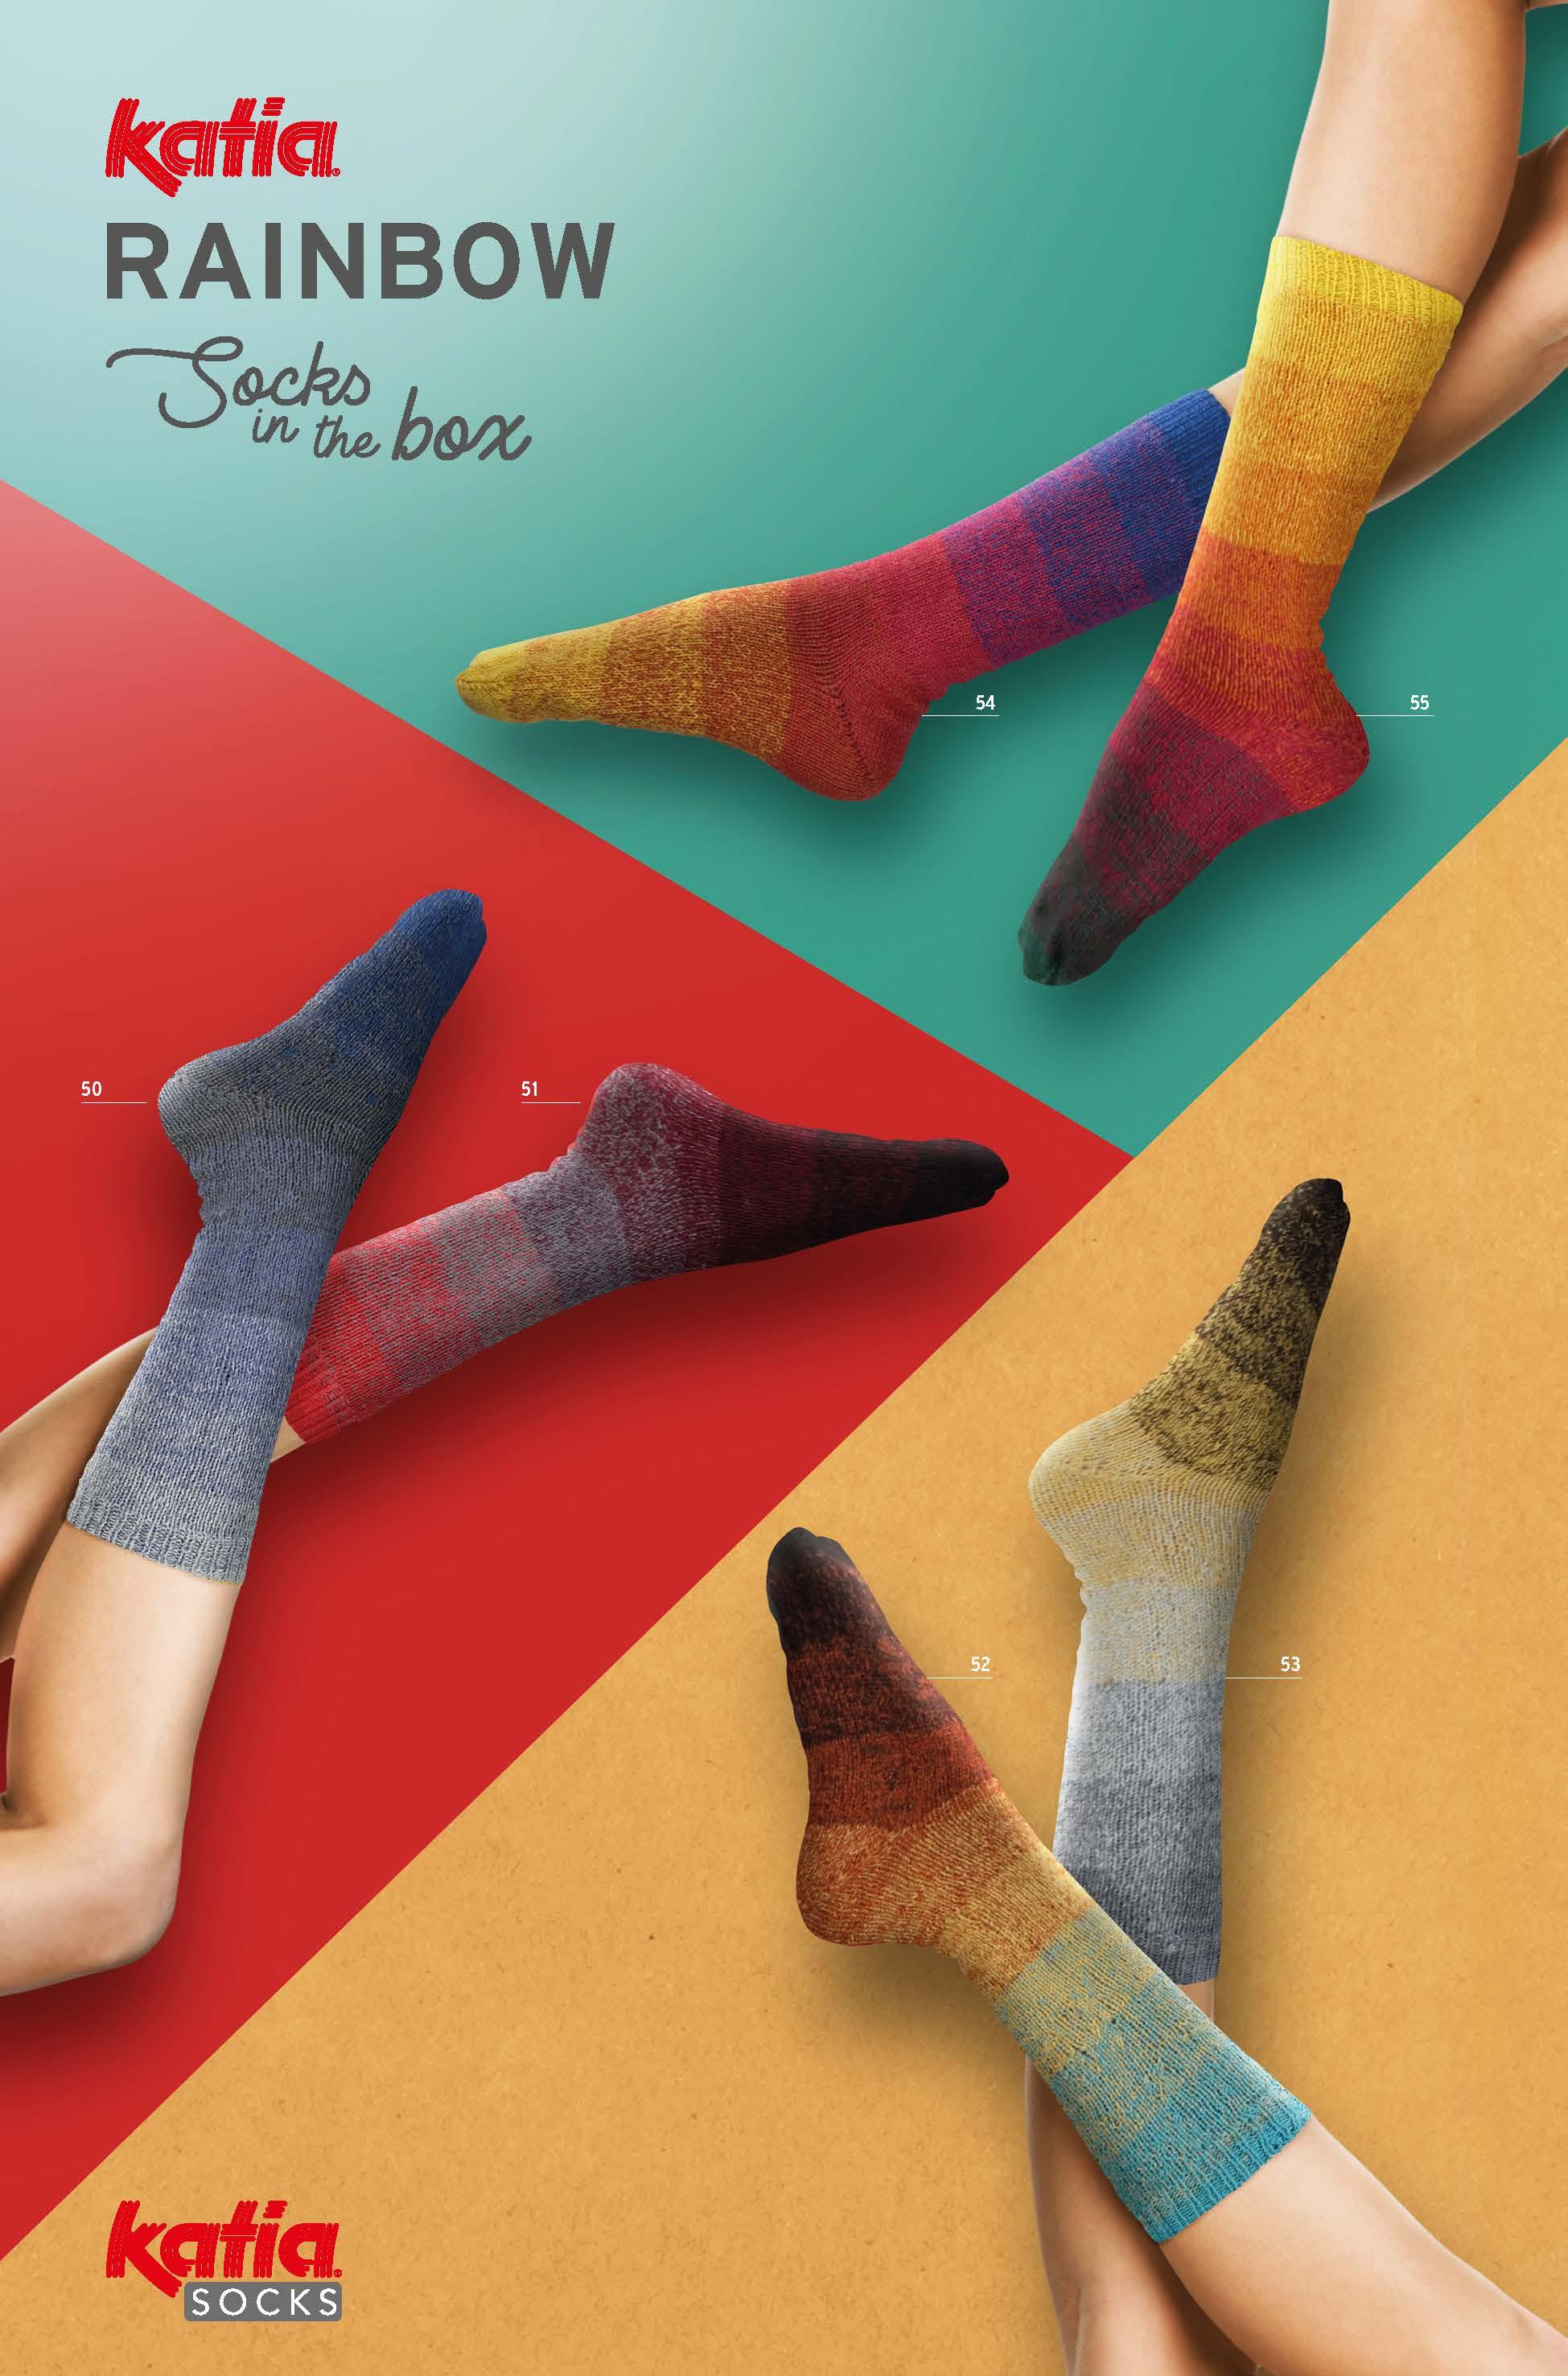 neue-katia-garne-herbst-winter-2019-20-rainbow-socks